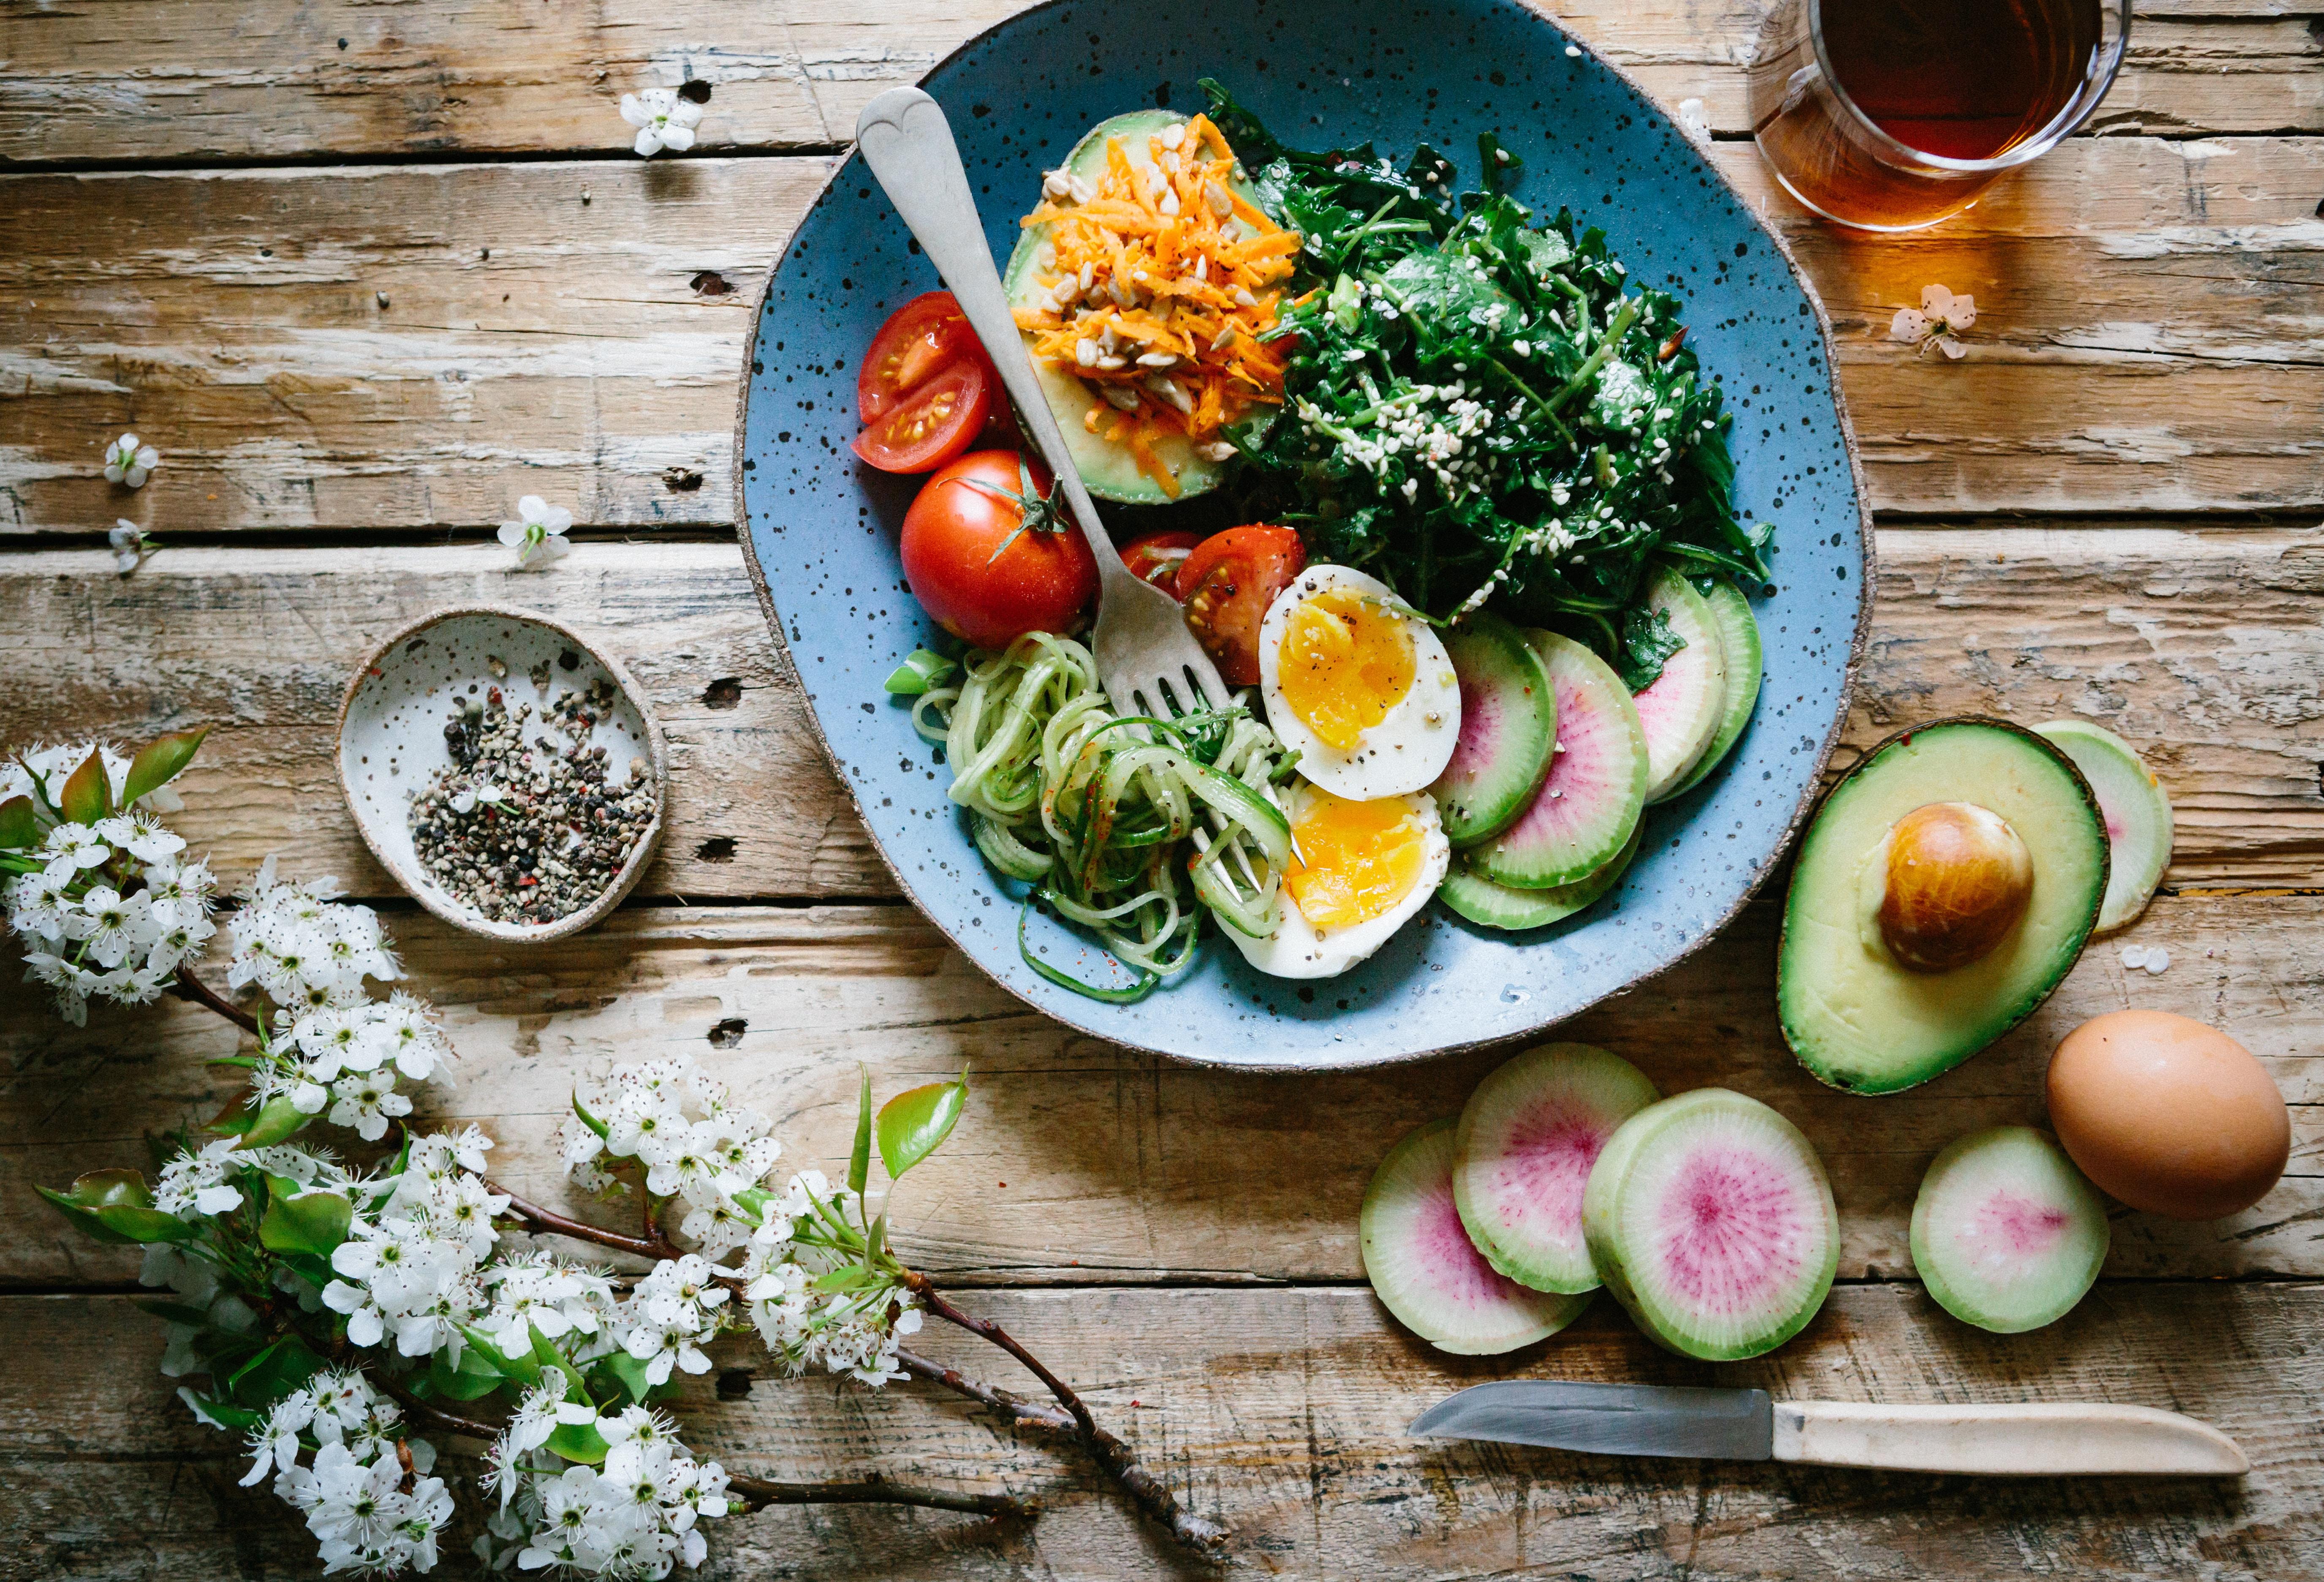 gezond-eten-7-tips thumbnail